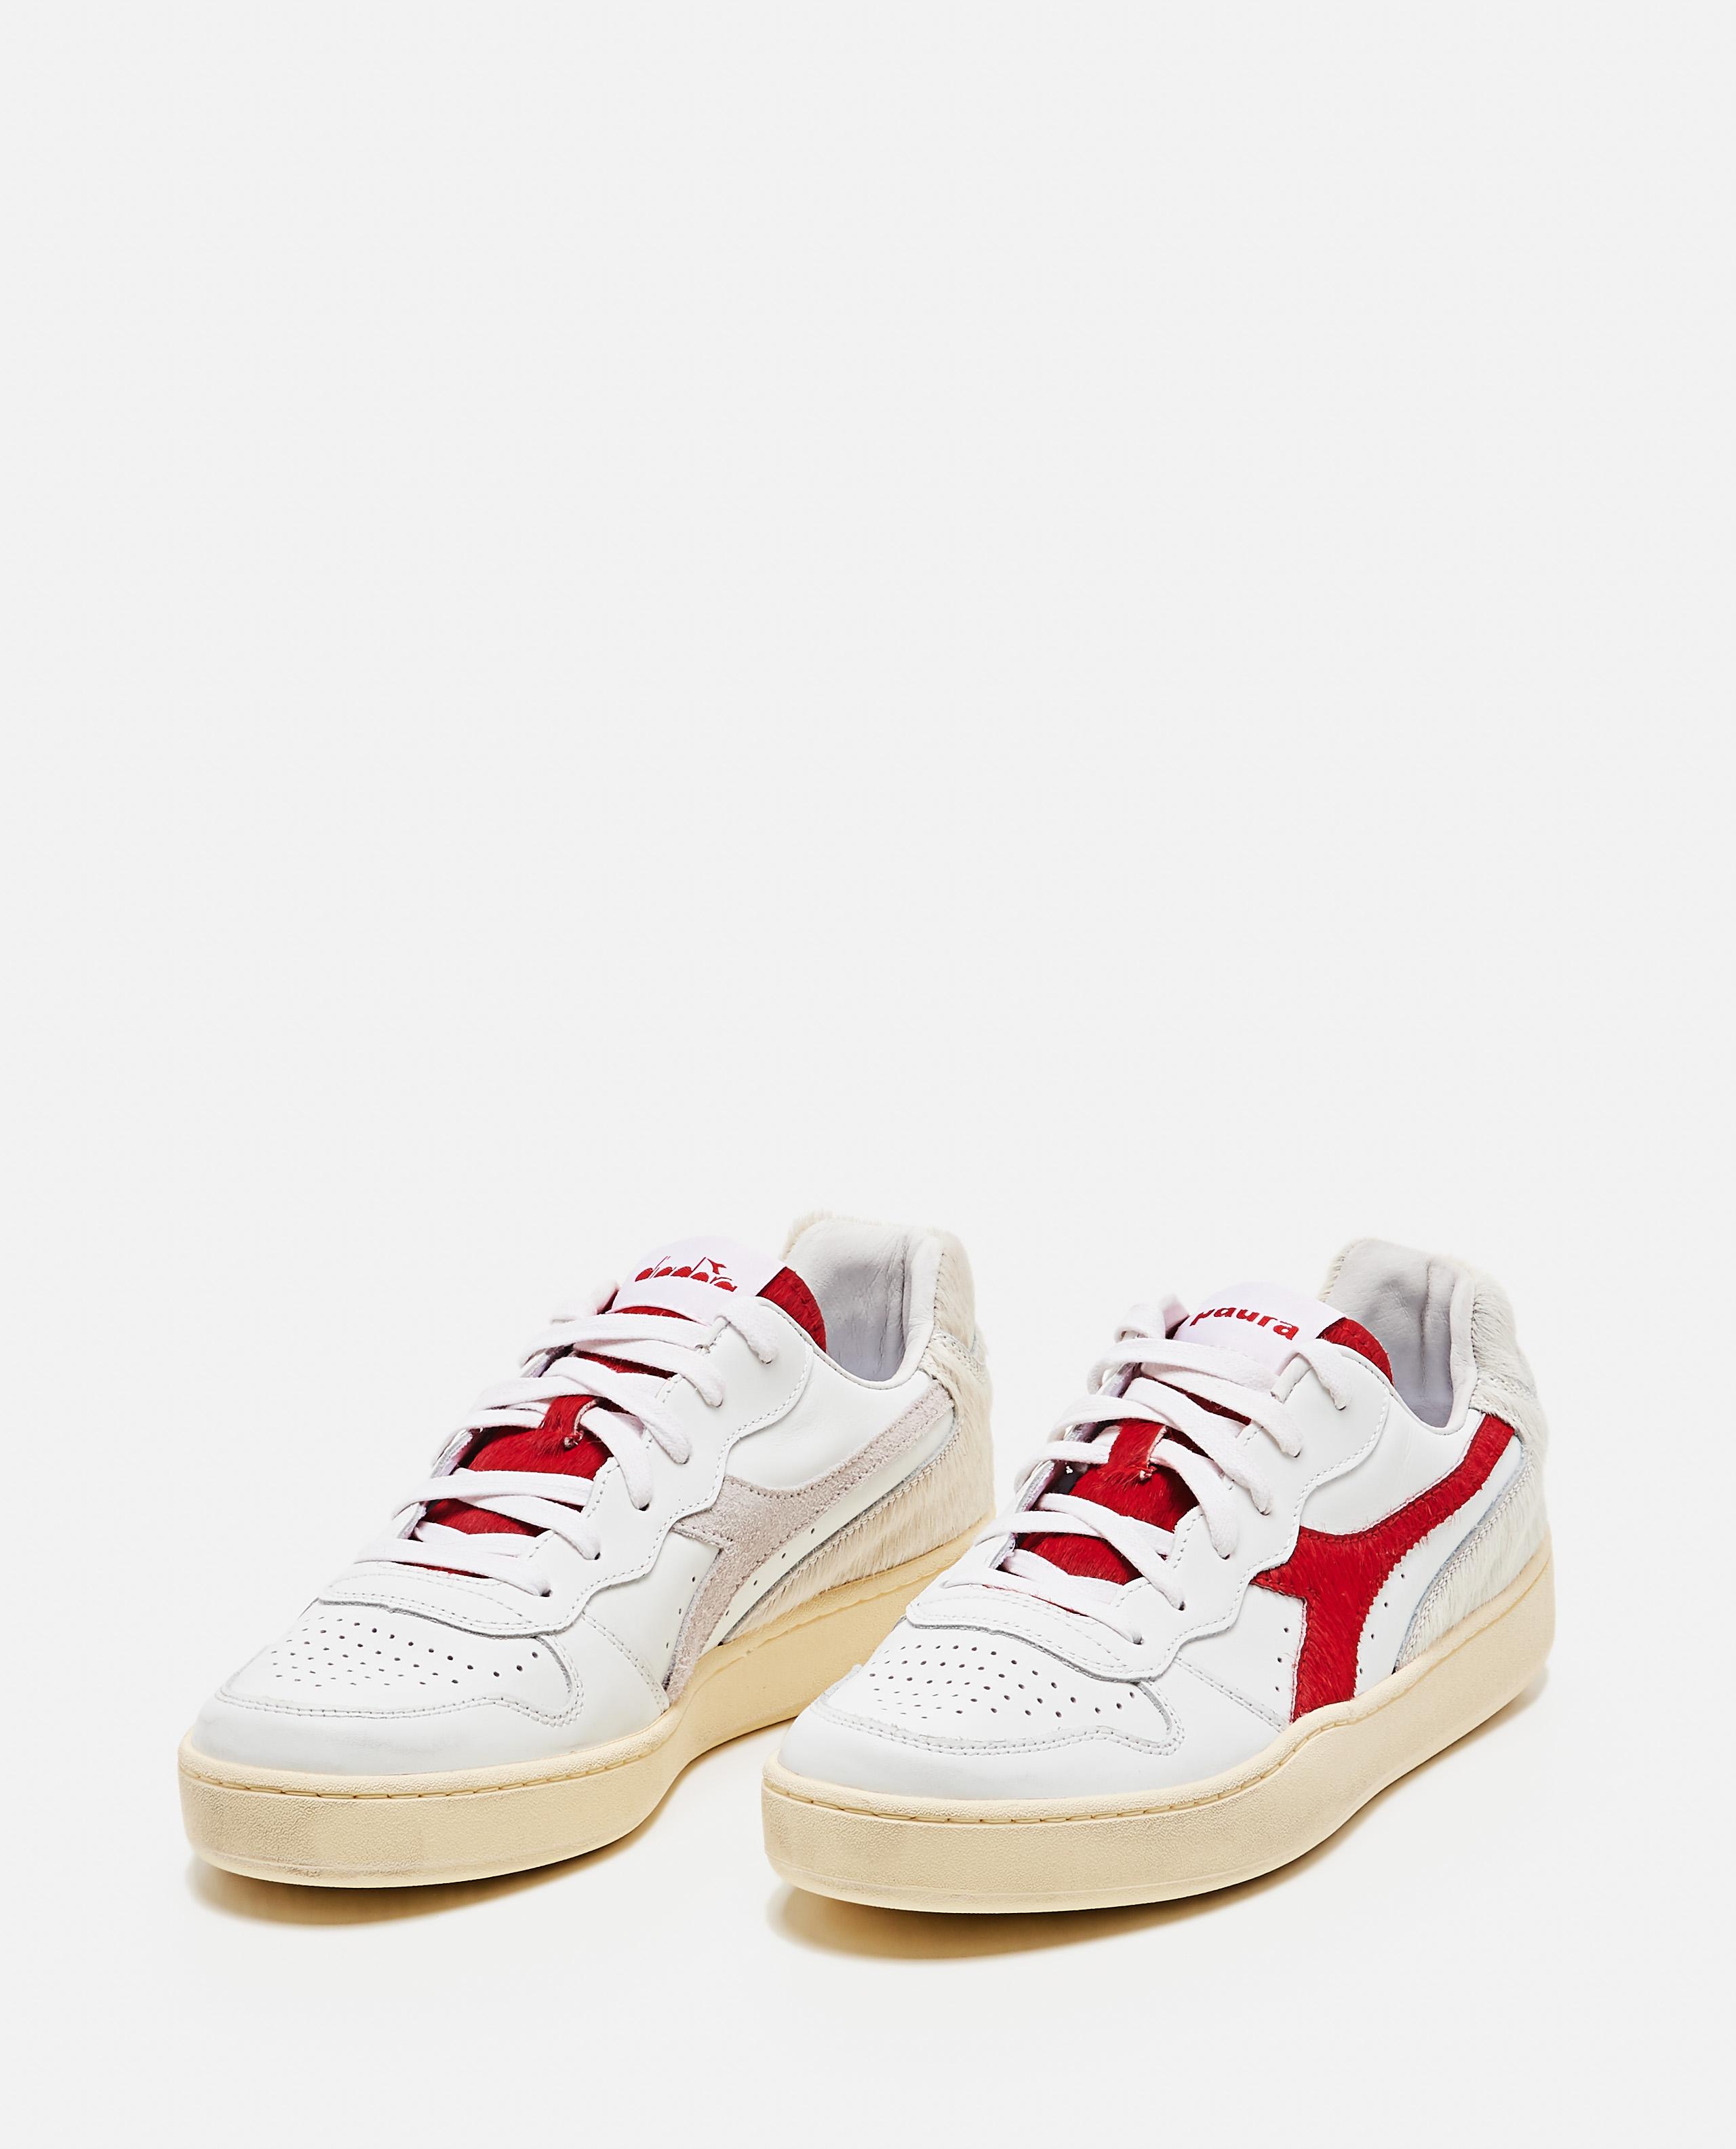 Diadora x Paura Mi Basket Low Horsy Sneakers